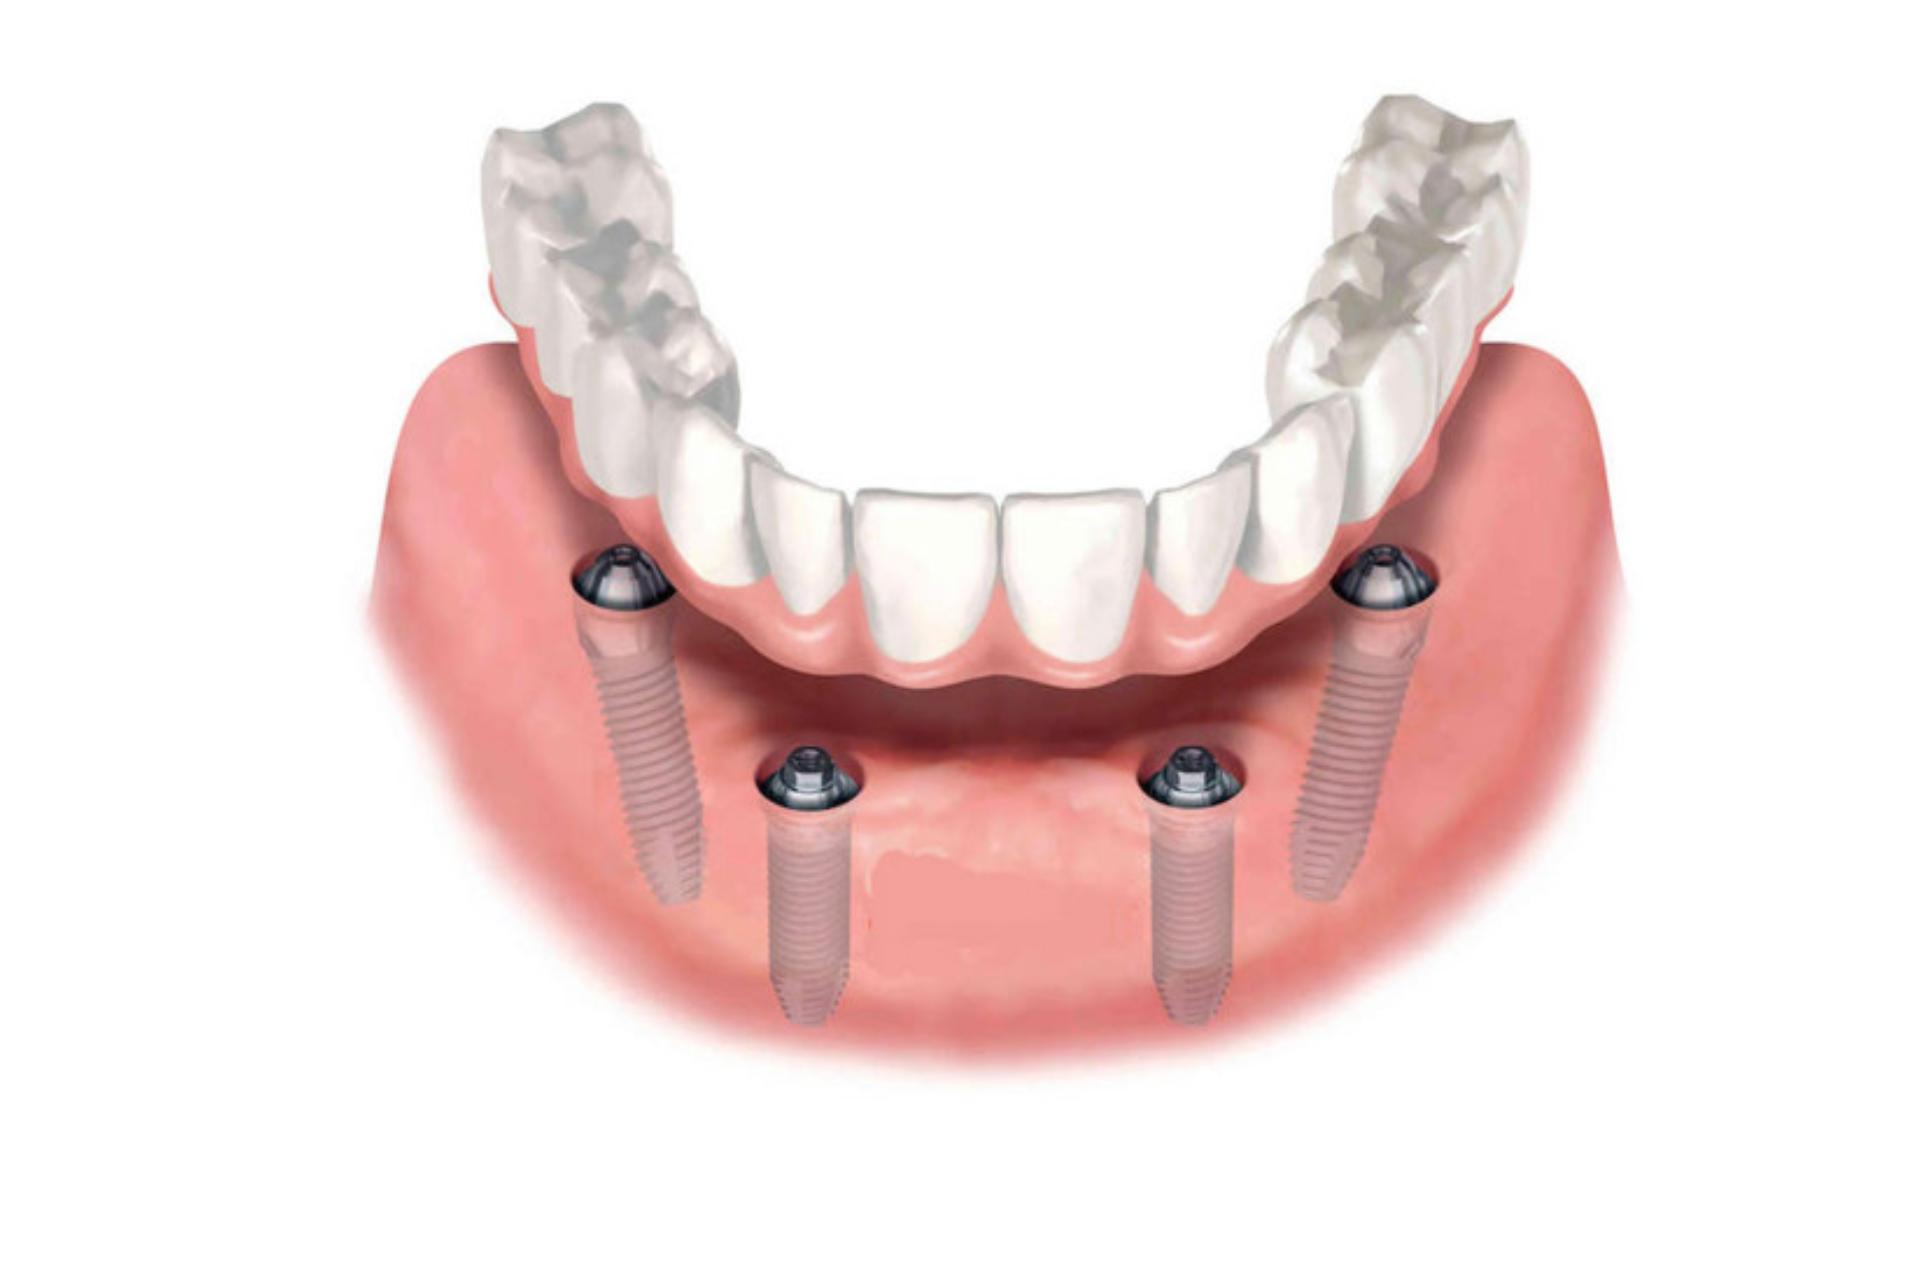 All-on-4 (samo implantati)